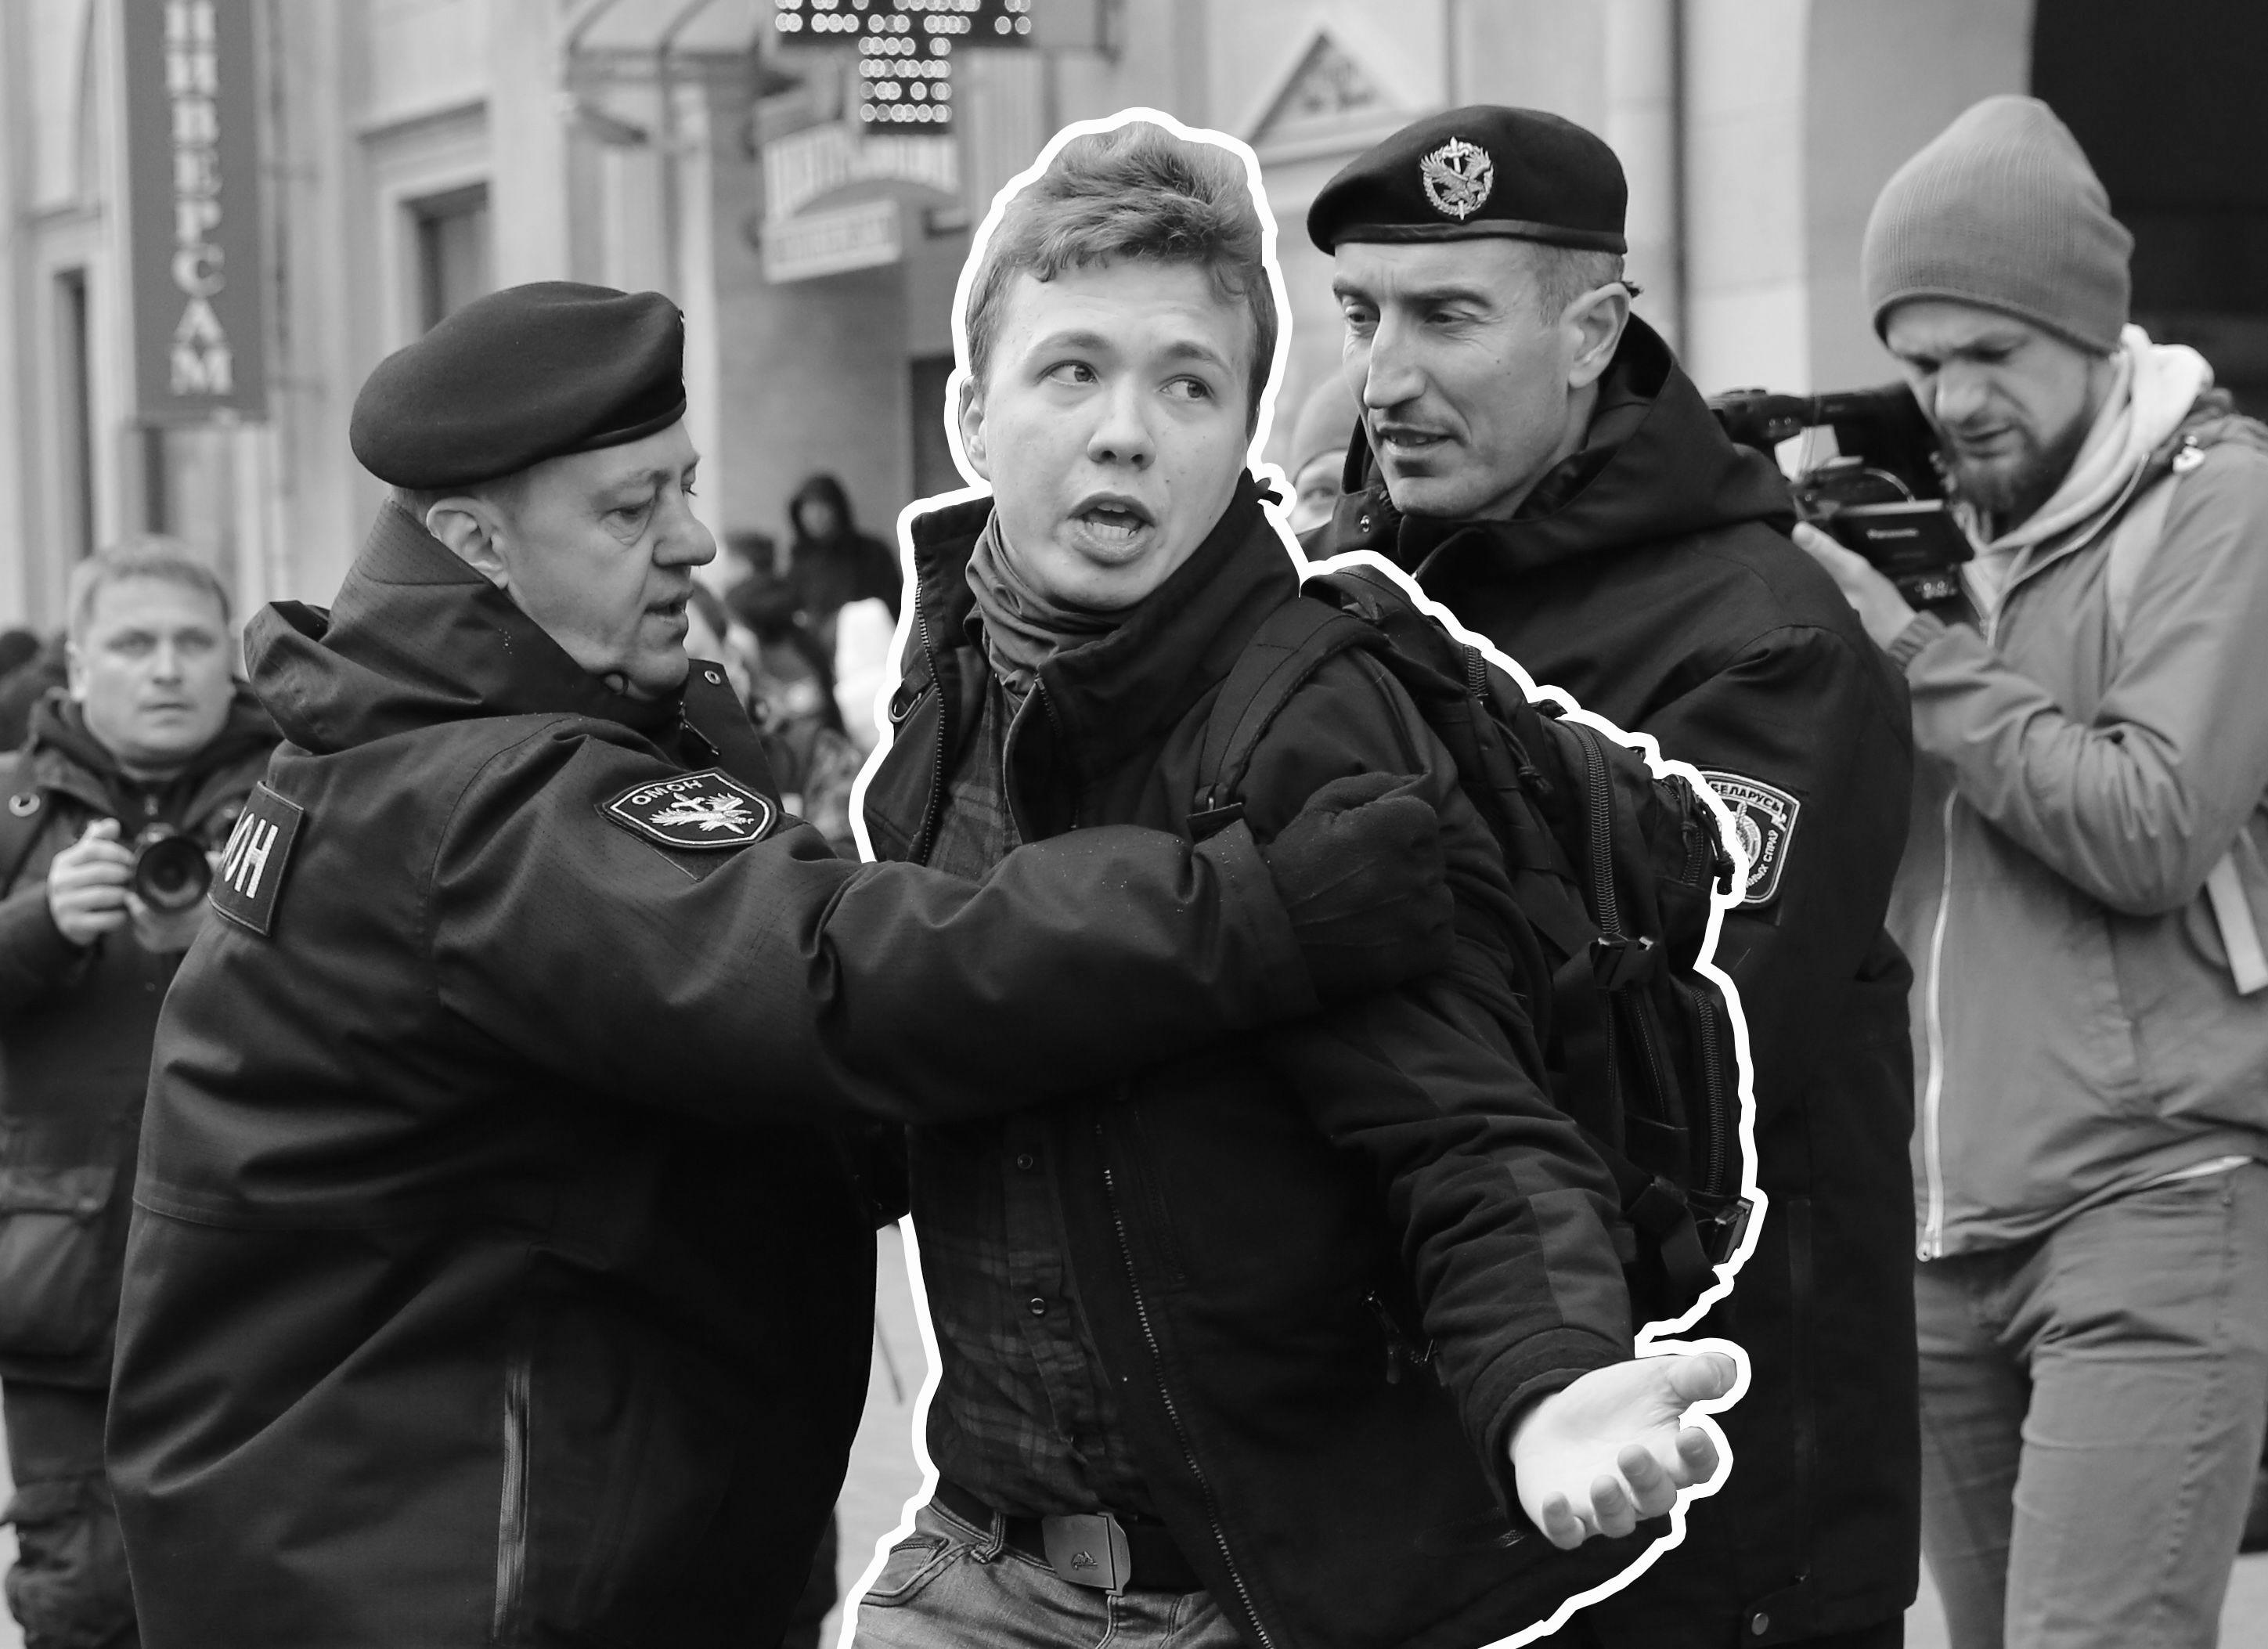 President Joe Biden: Arrest of dissident journalist by Belarus  a direct affront to international norms